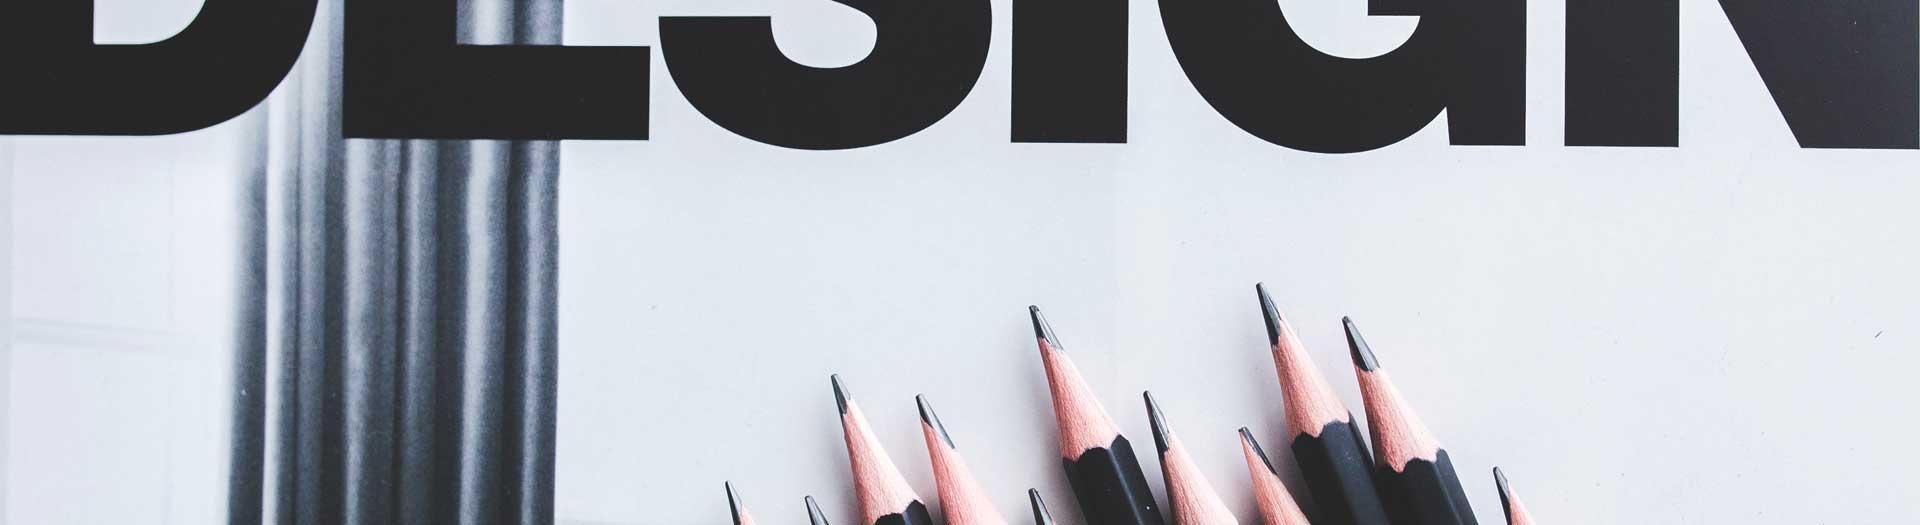 las vegas graphic design services